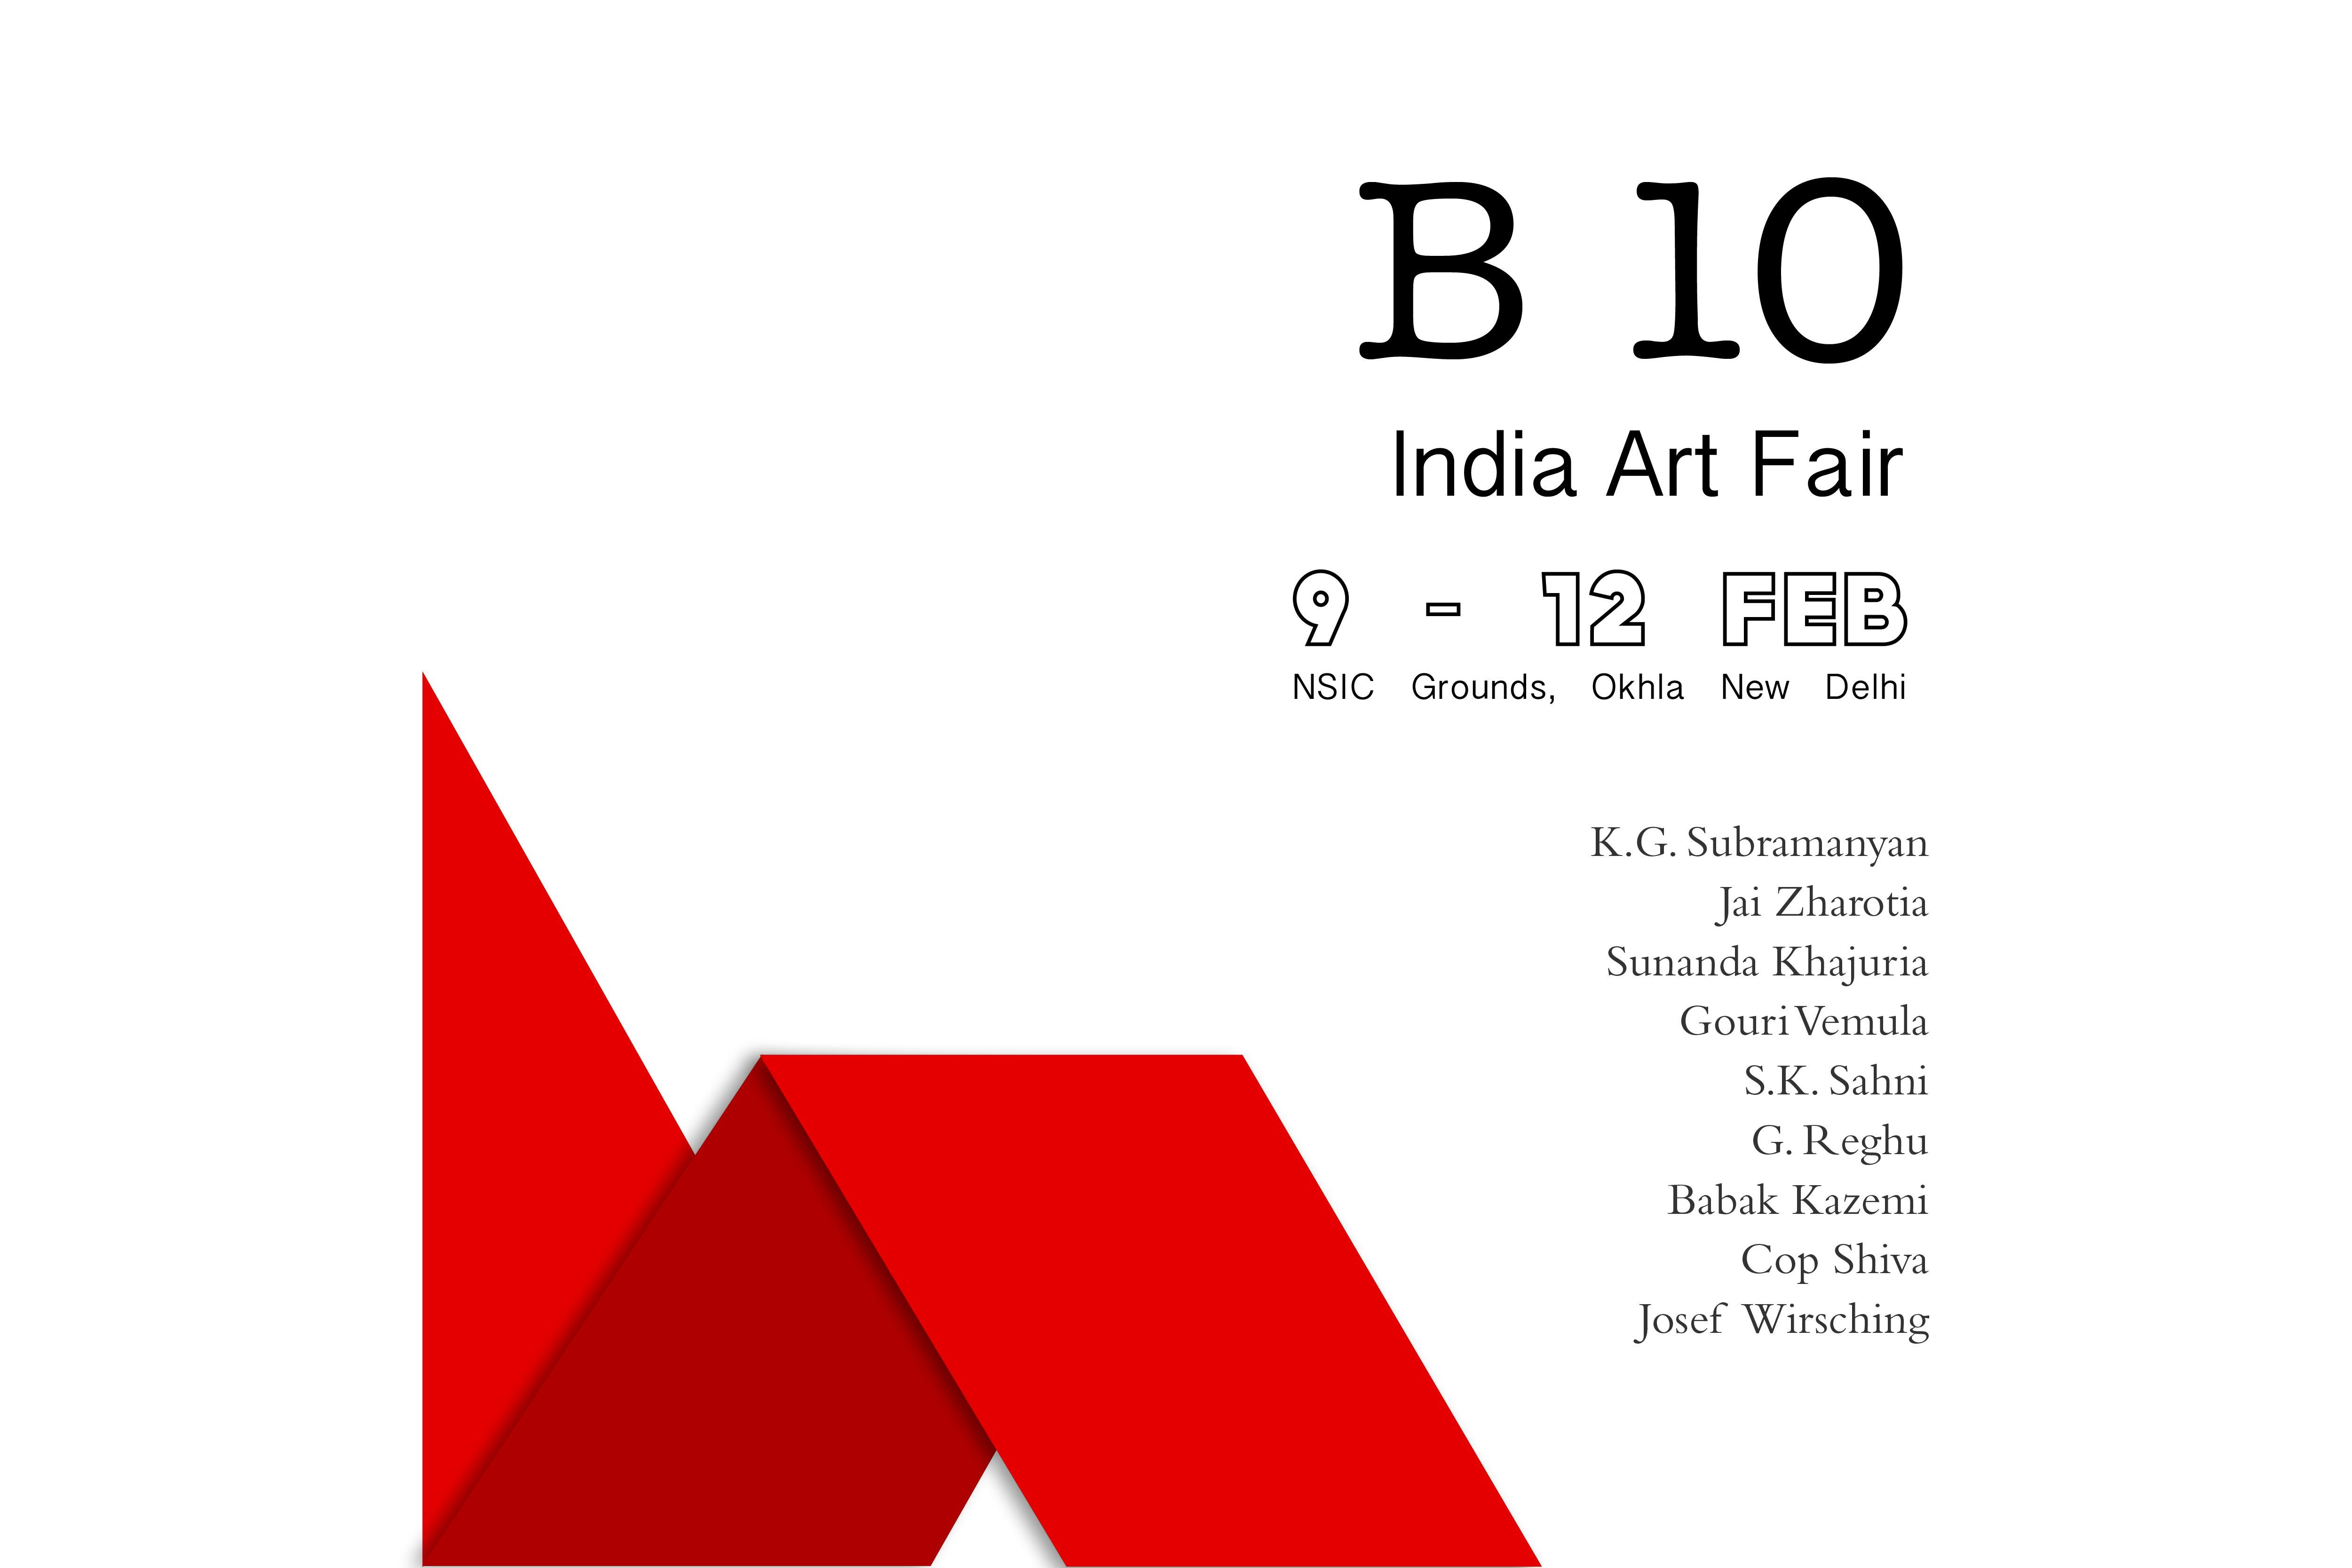 India Art Fair 2018